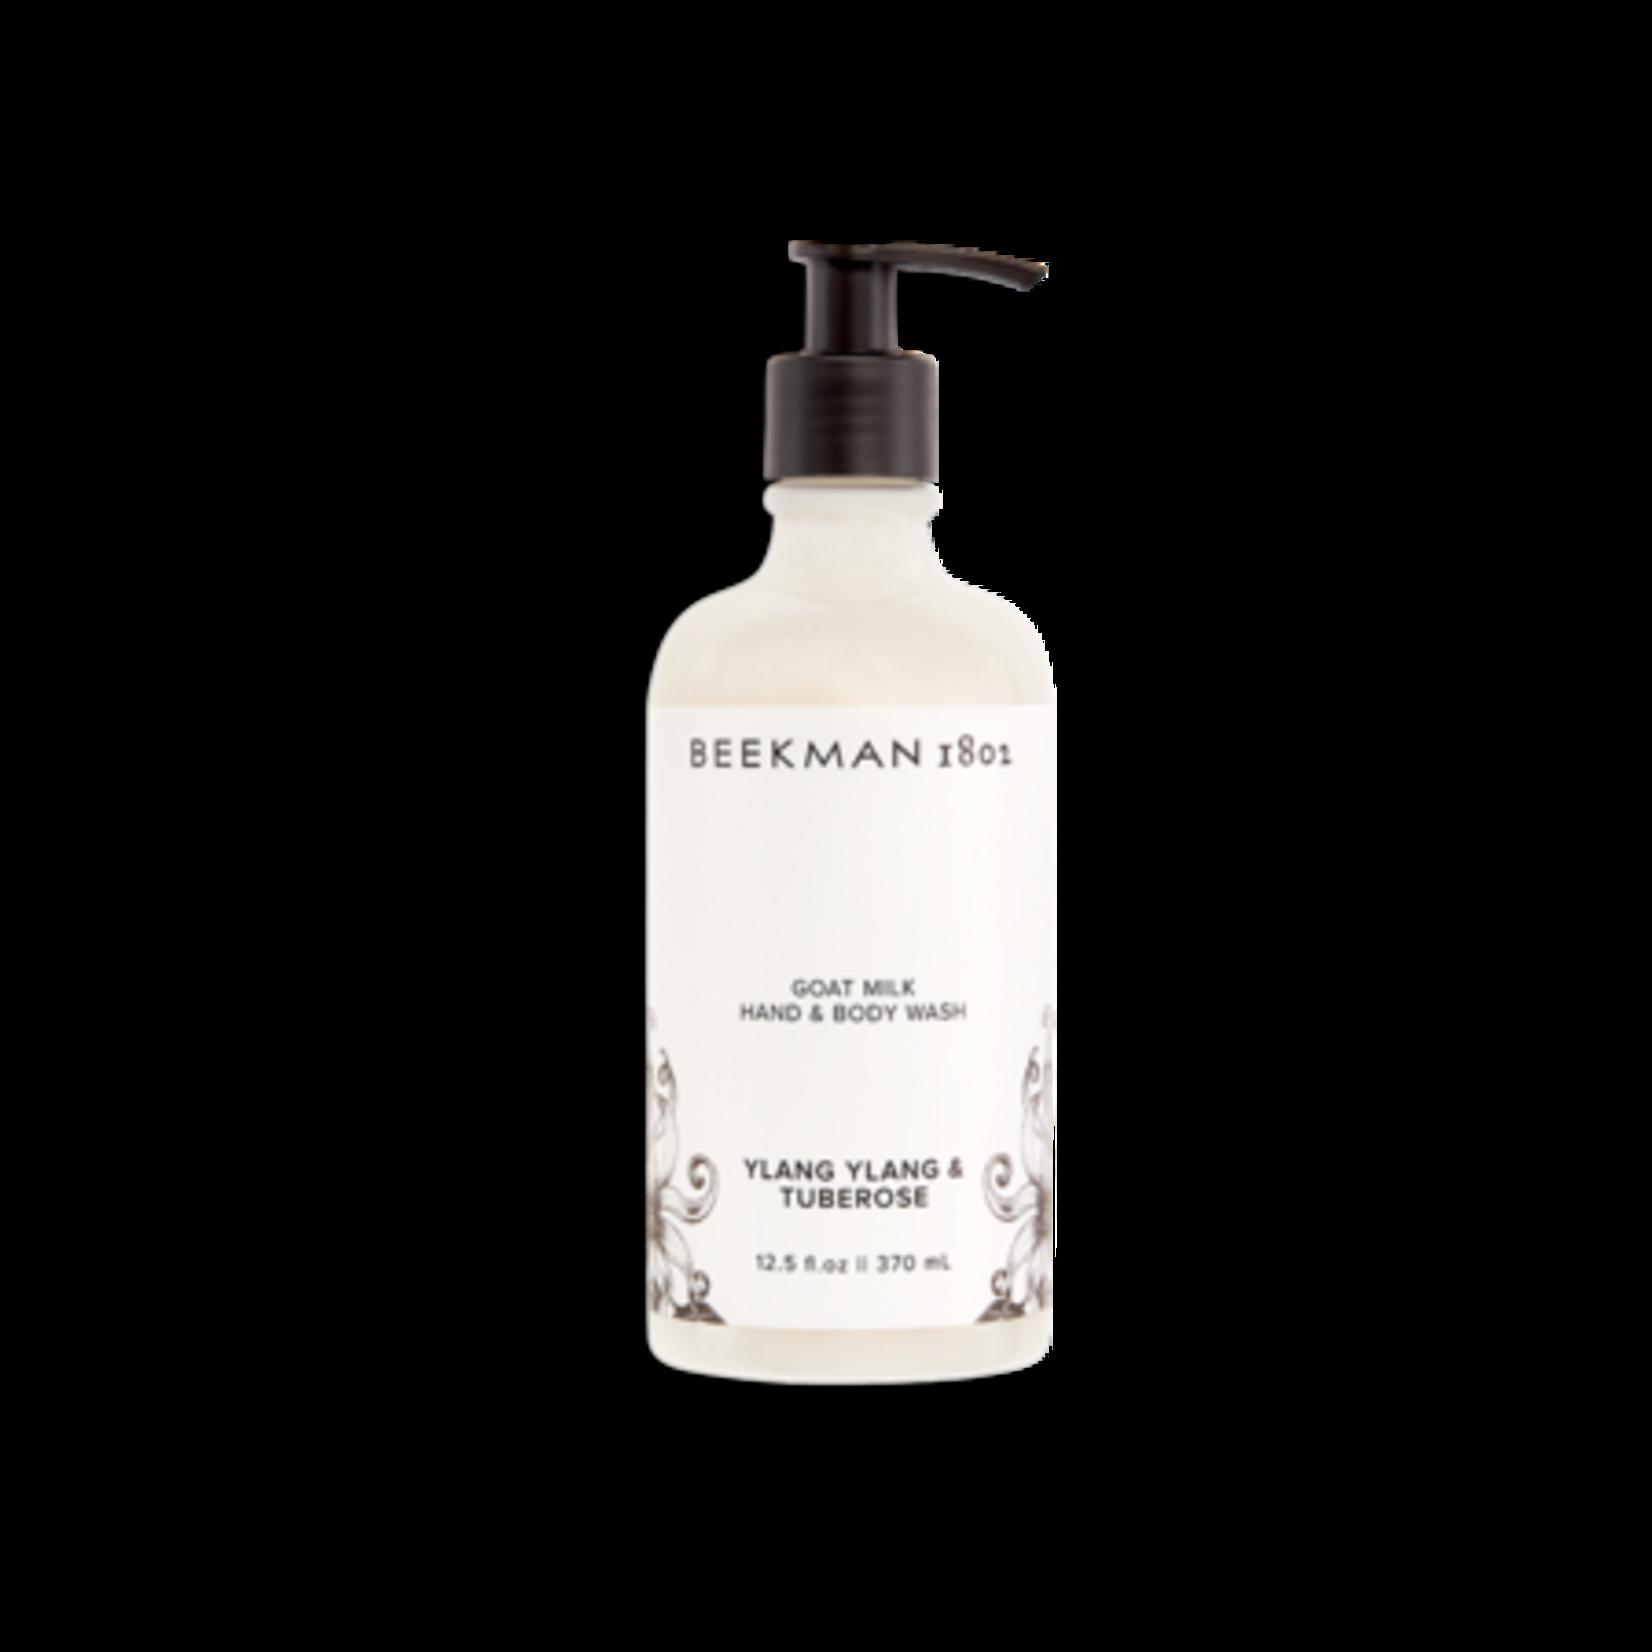 BEEKMAN 1802 Ylang Ylang & Tuberose Hand & Body Wash